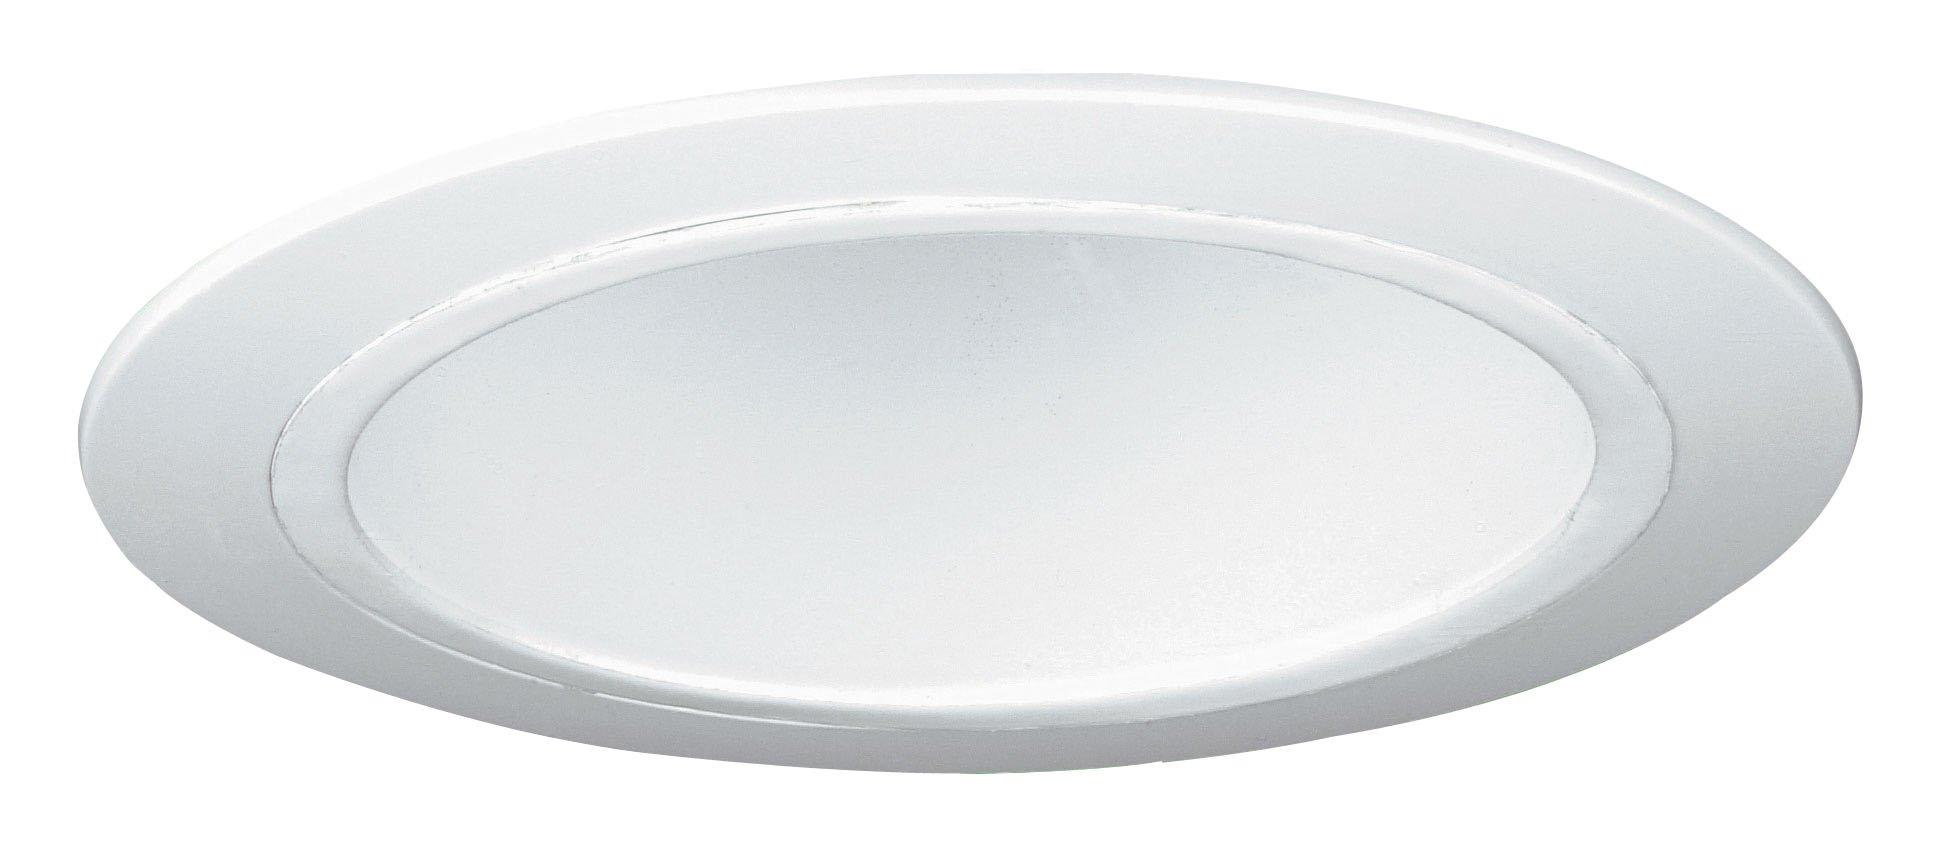 Yosemite Home Decor HE5698T 6-Inch White Horizontal Reflector Recessed Trim